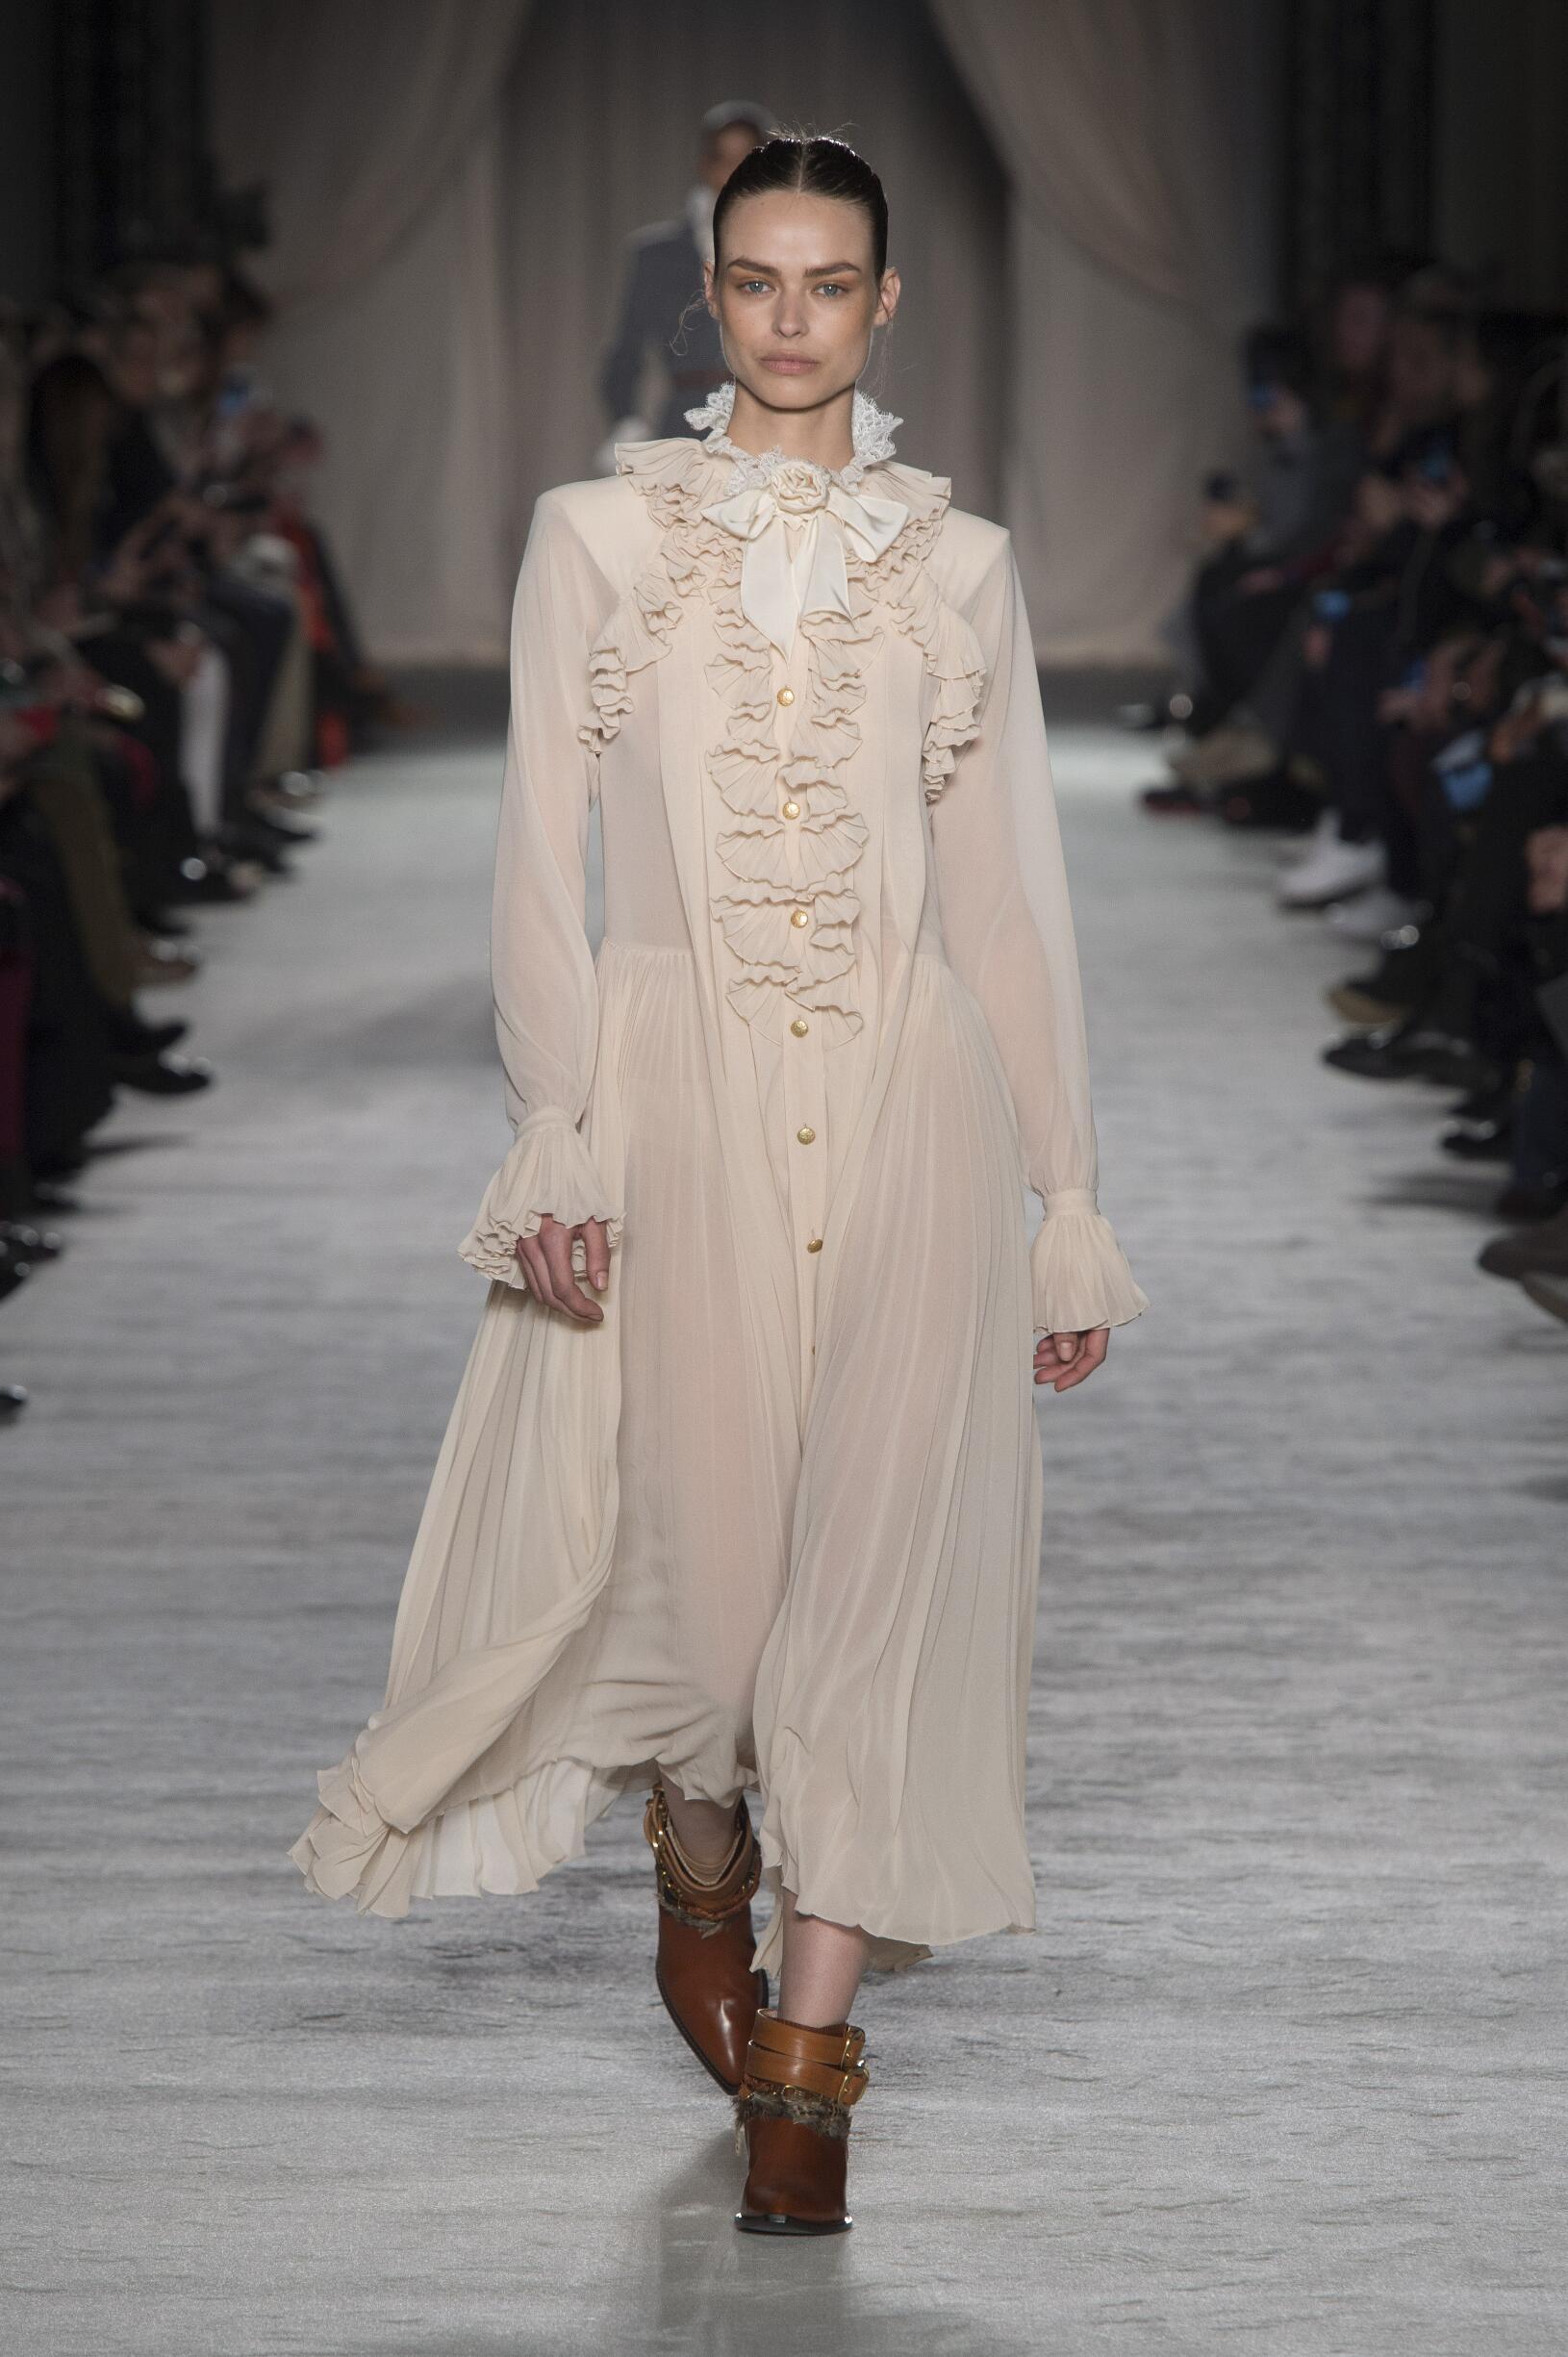 Woman FW 2018-19 Fashion Show Philosophy di Lorenzo Serafini